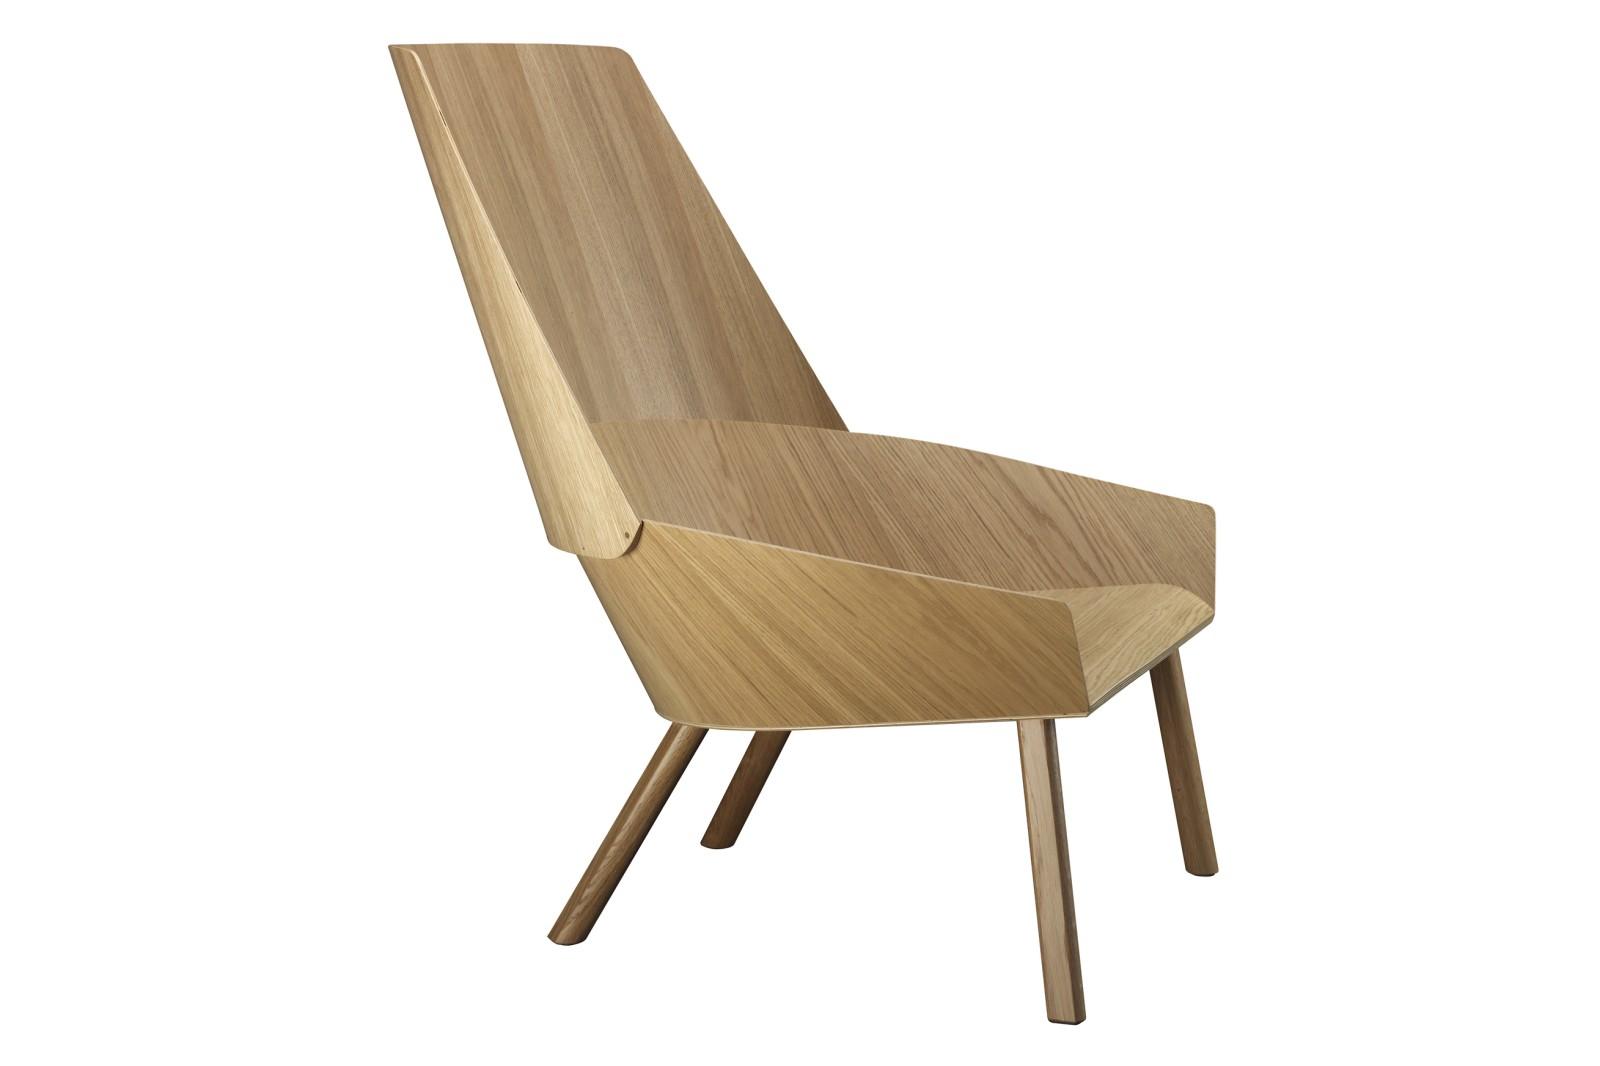 EC03 Eugene Lounge Chair Neutral, Clear Lacquered Oak Veneer